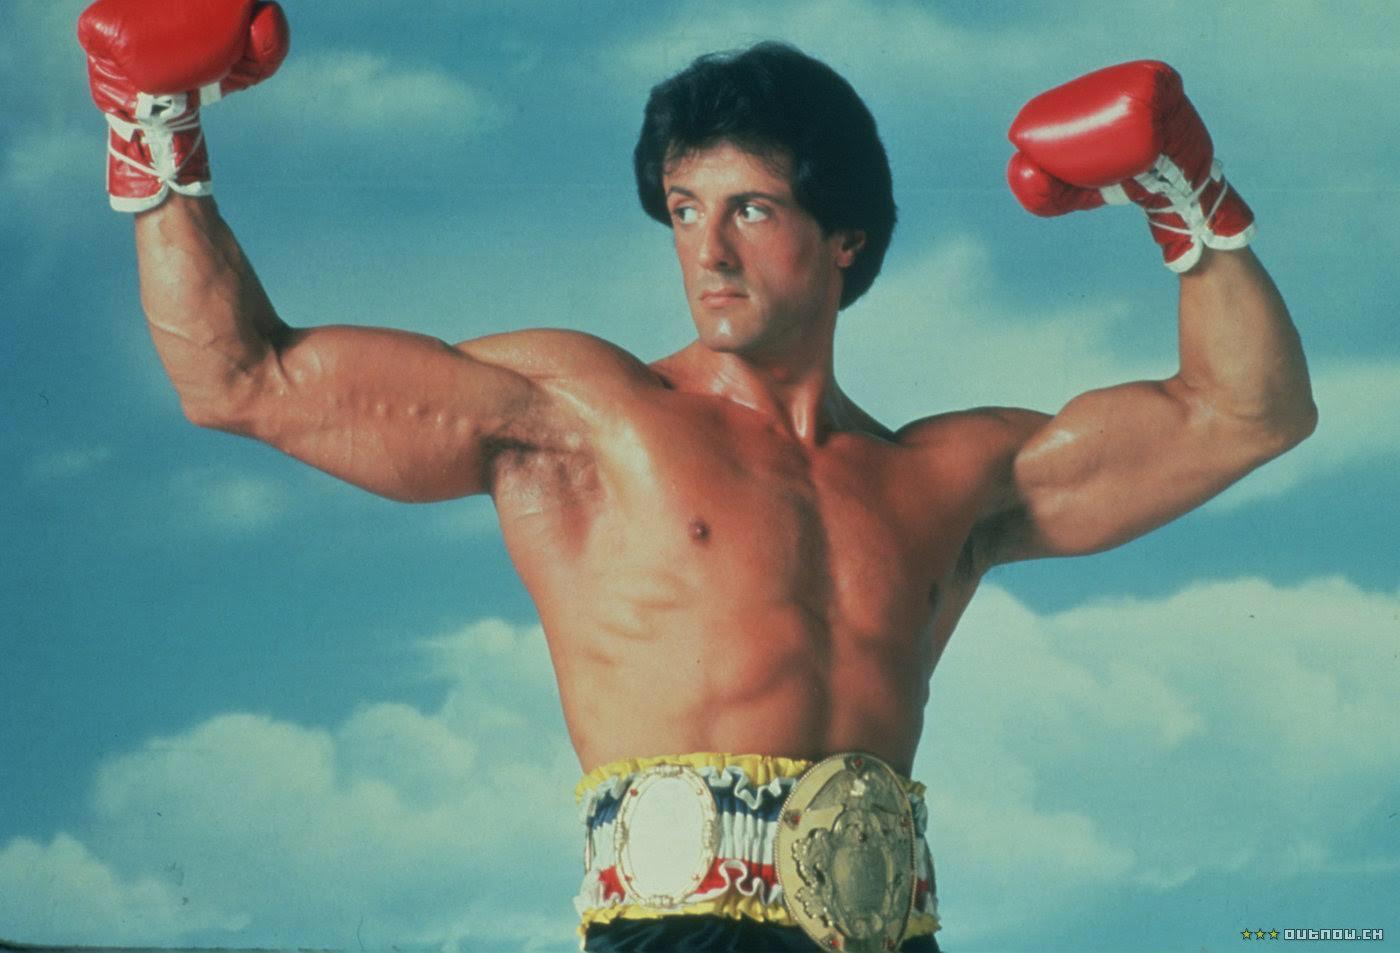 Pin By Lina Hammarsten On Rocky For Life Sylvester Stallone Rocky Balboa Rocky Film